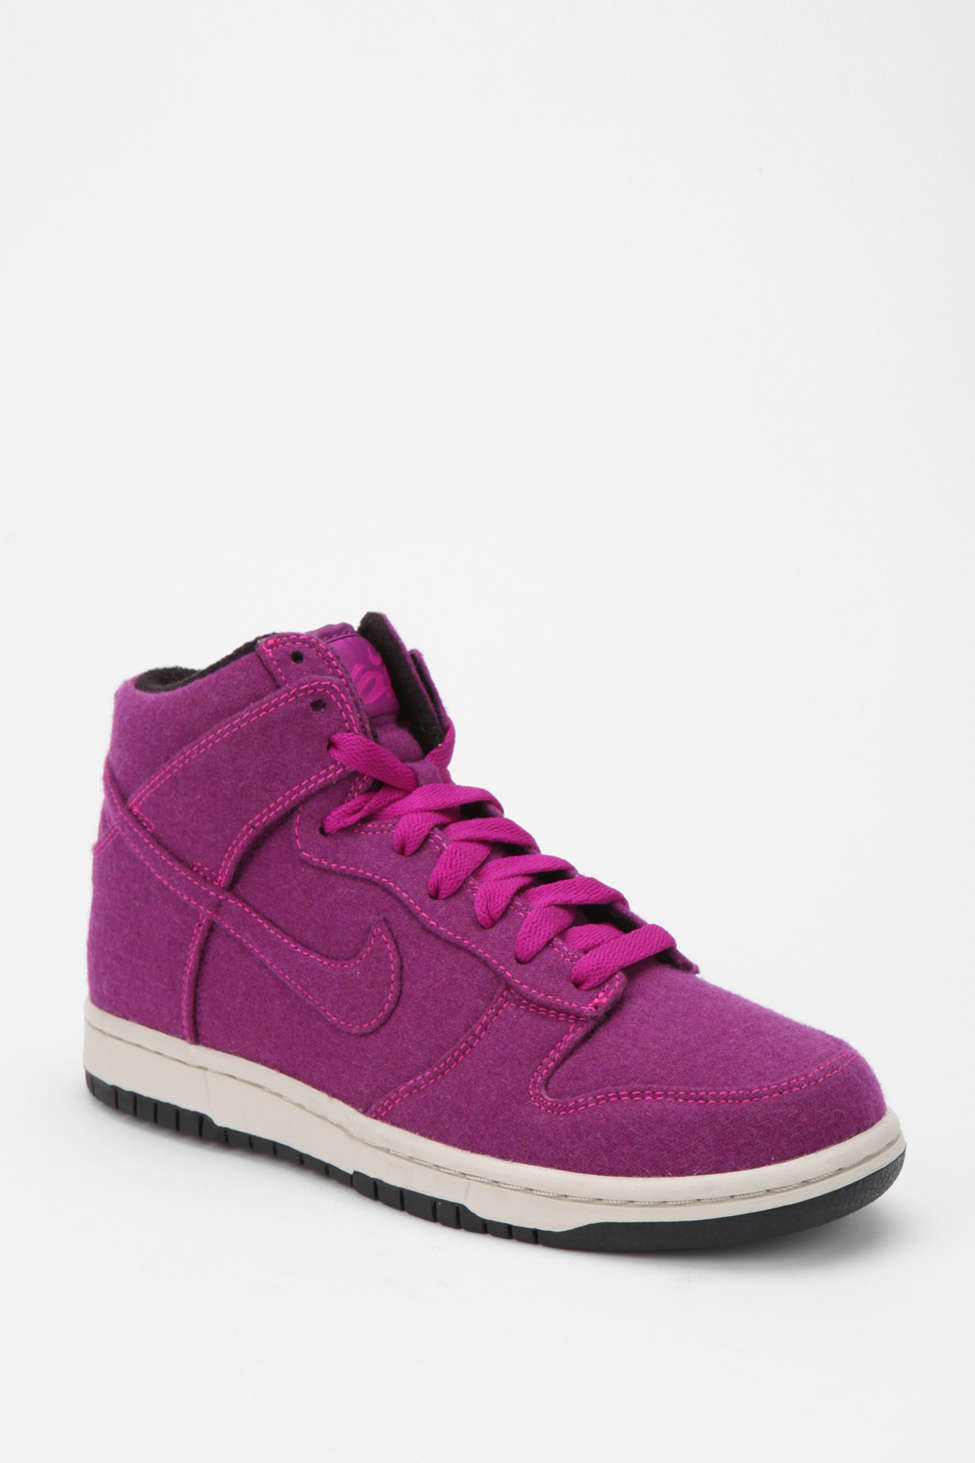 Nike Dunk Hi Sneaker Urban Outfitters